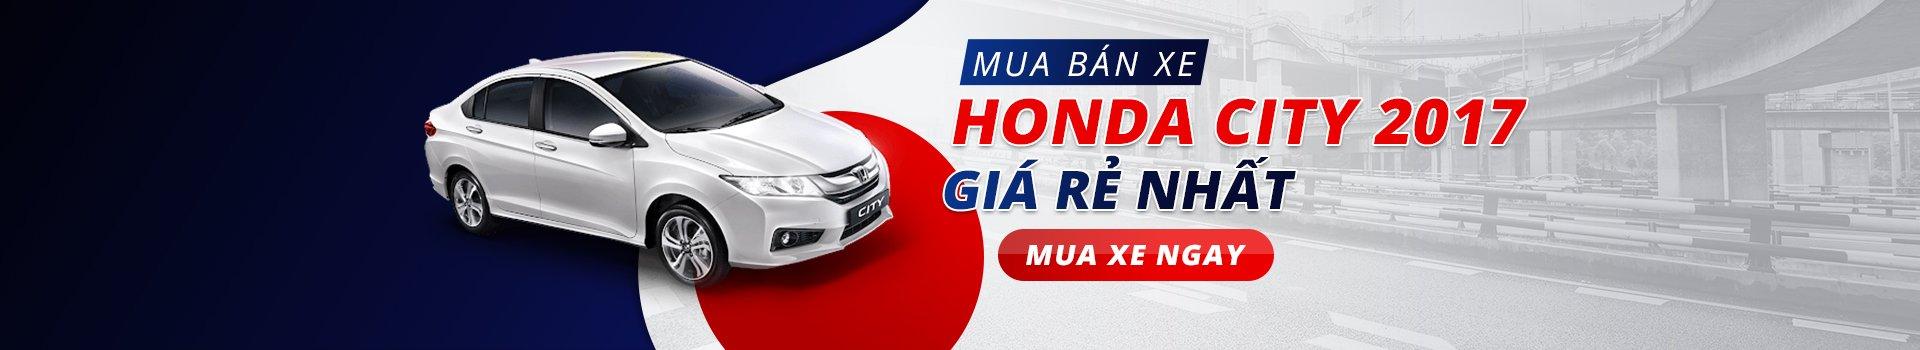 Hondacity2017